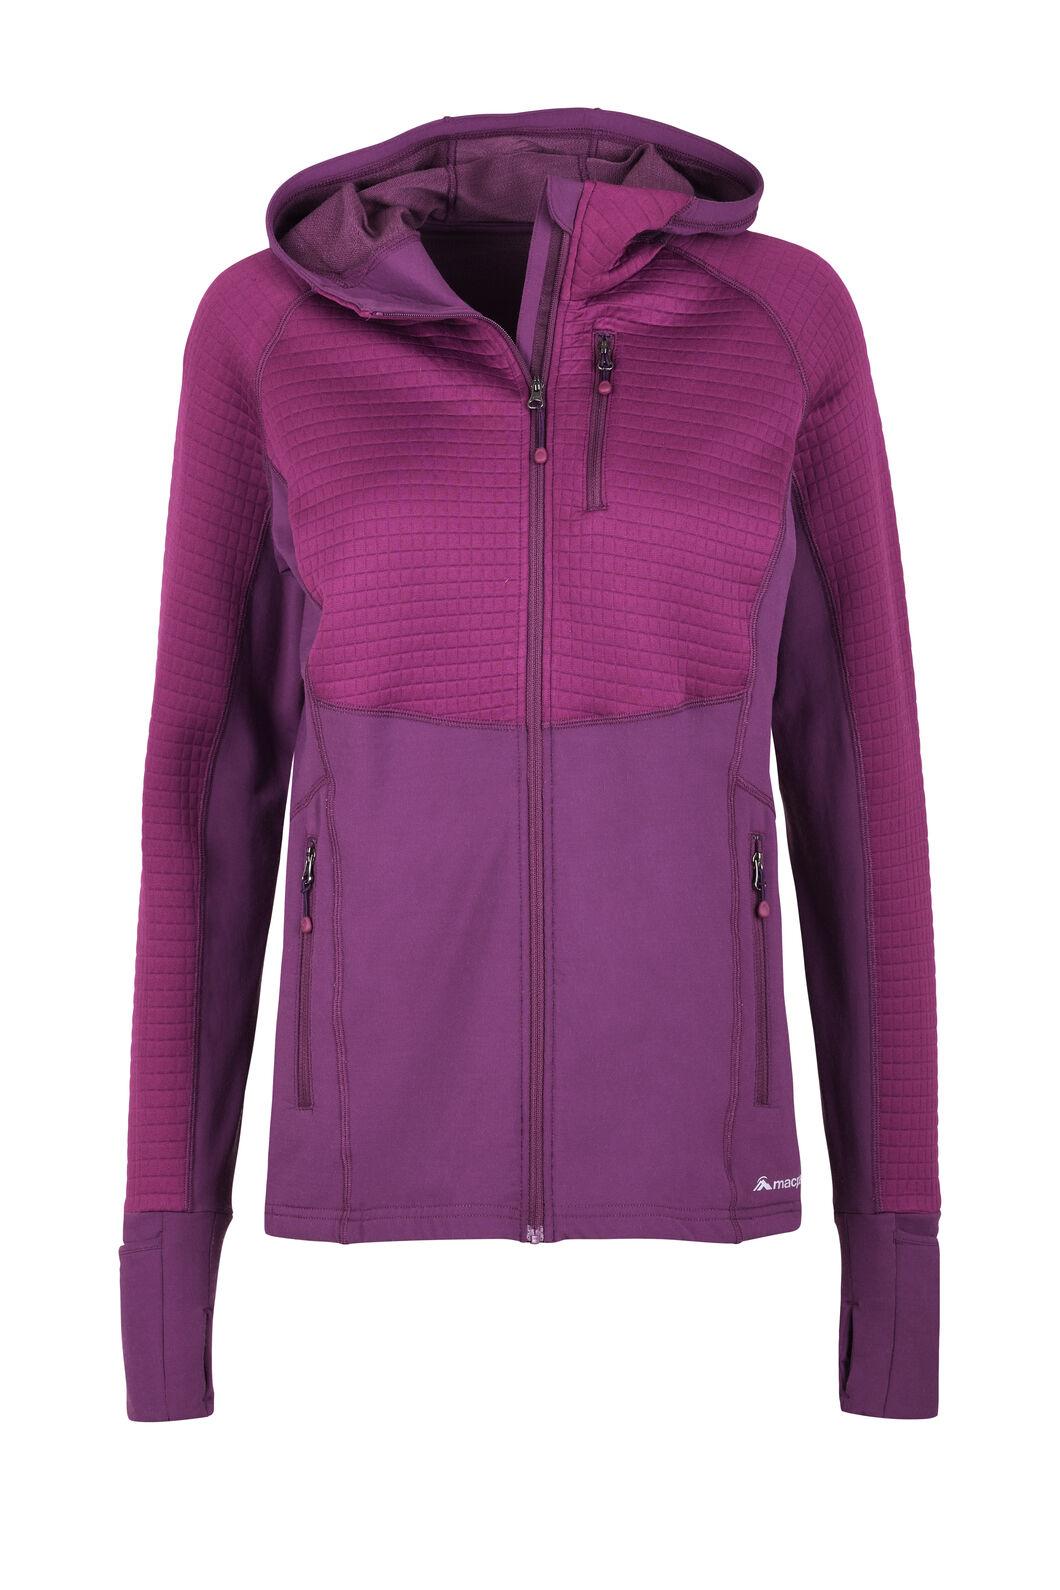 Macpac Delta Merino Blend Jacket — Women's, Magenta/Purple, hi-res